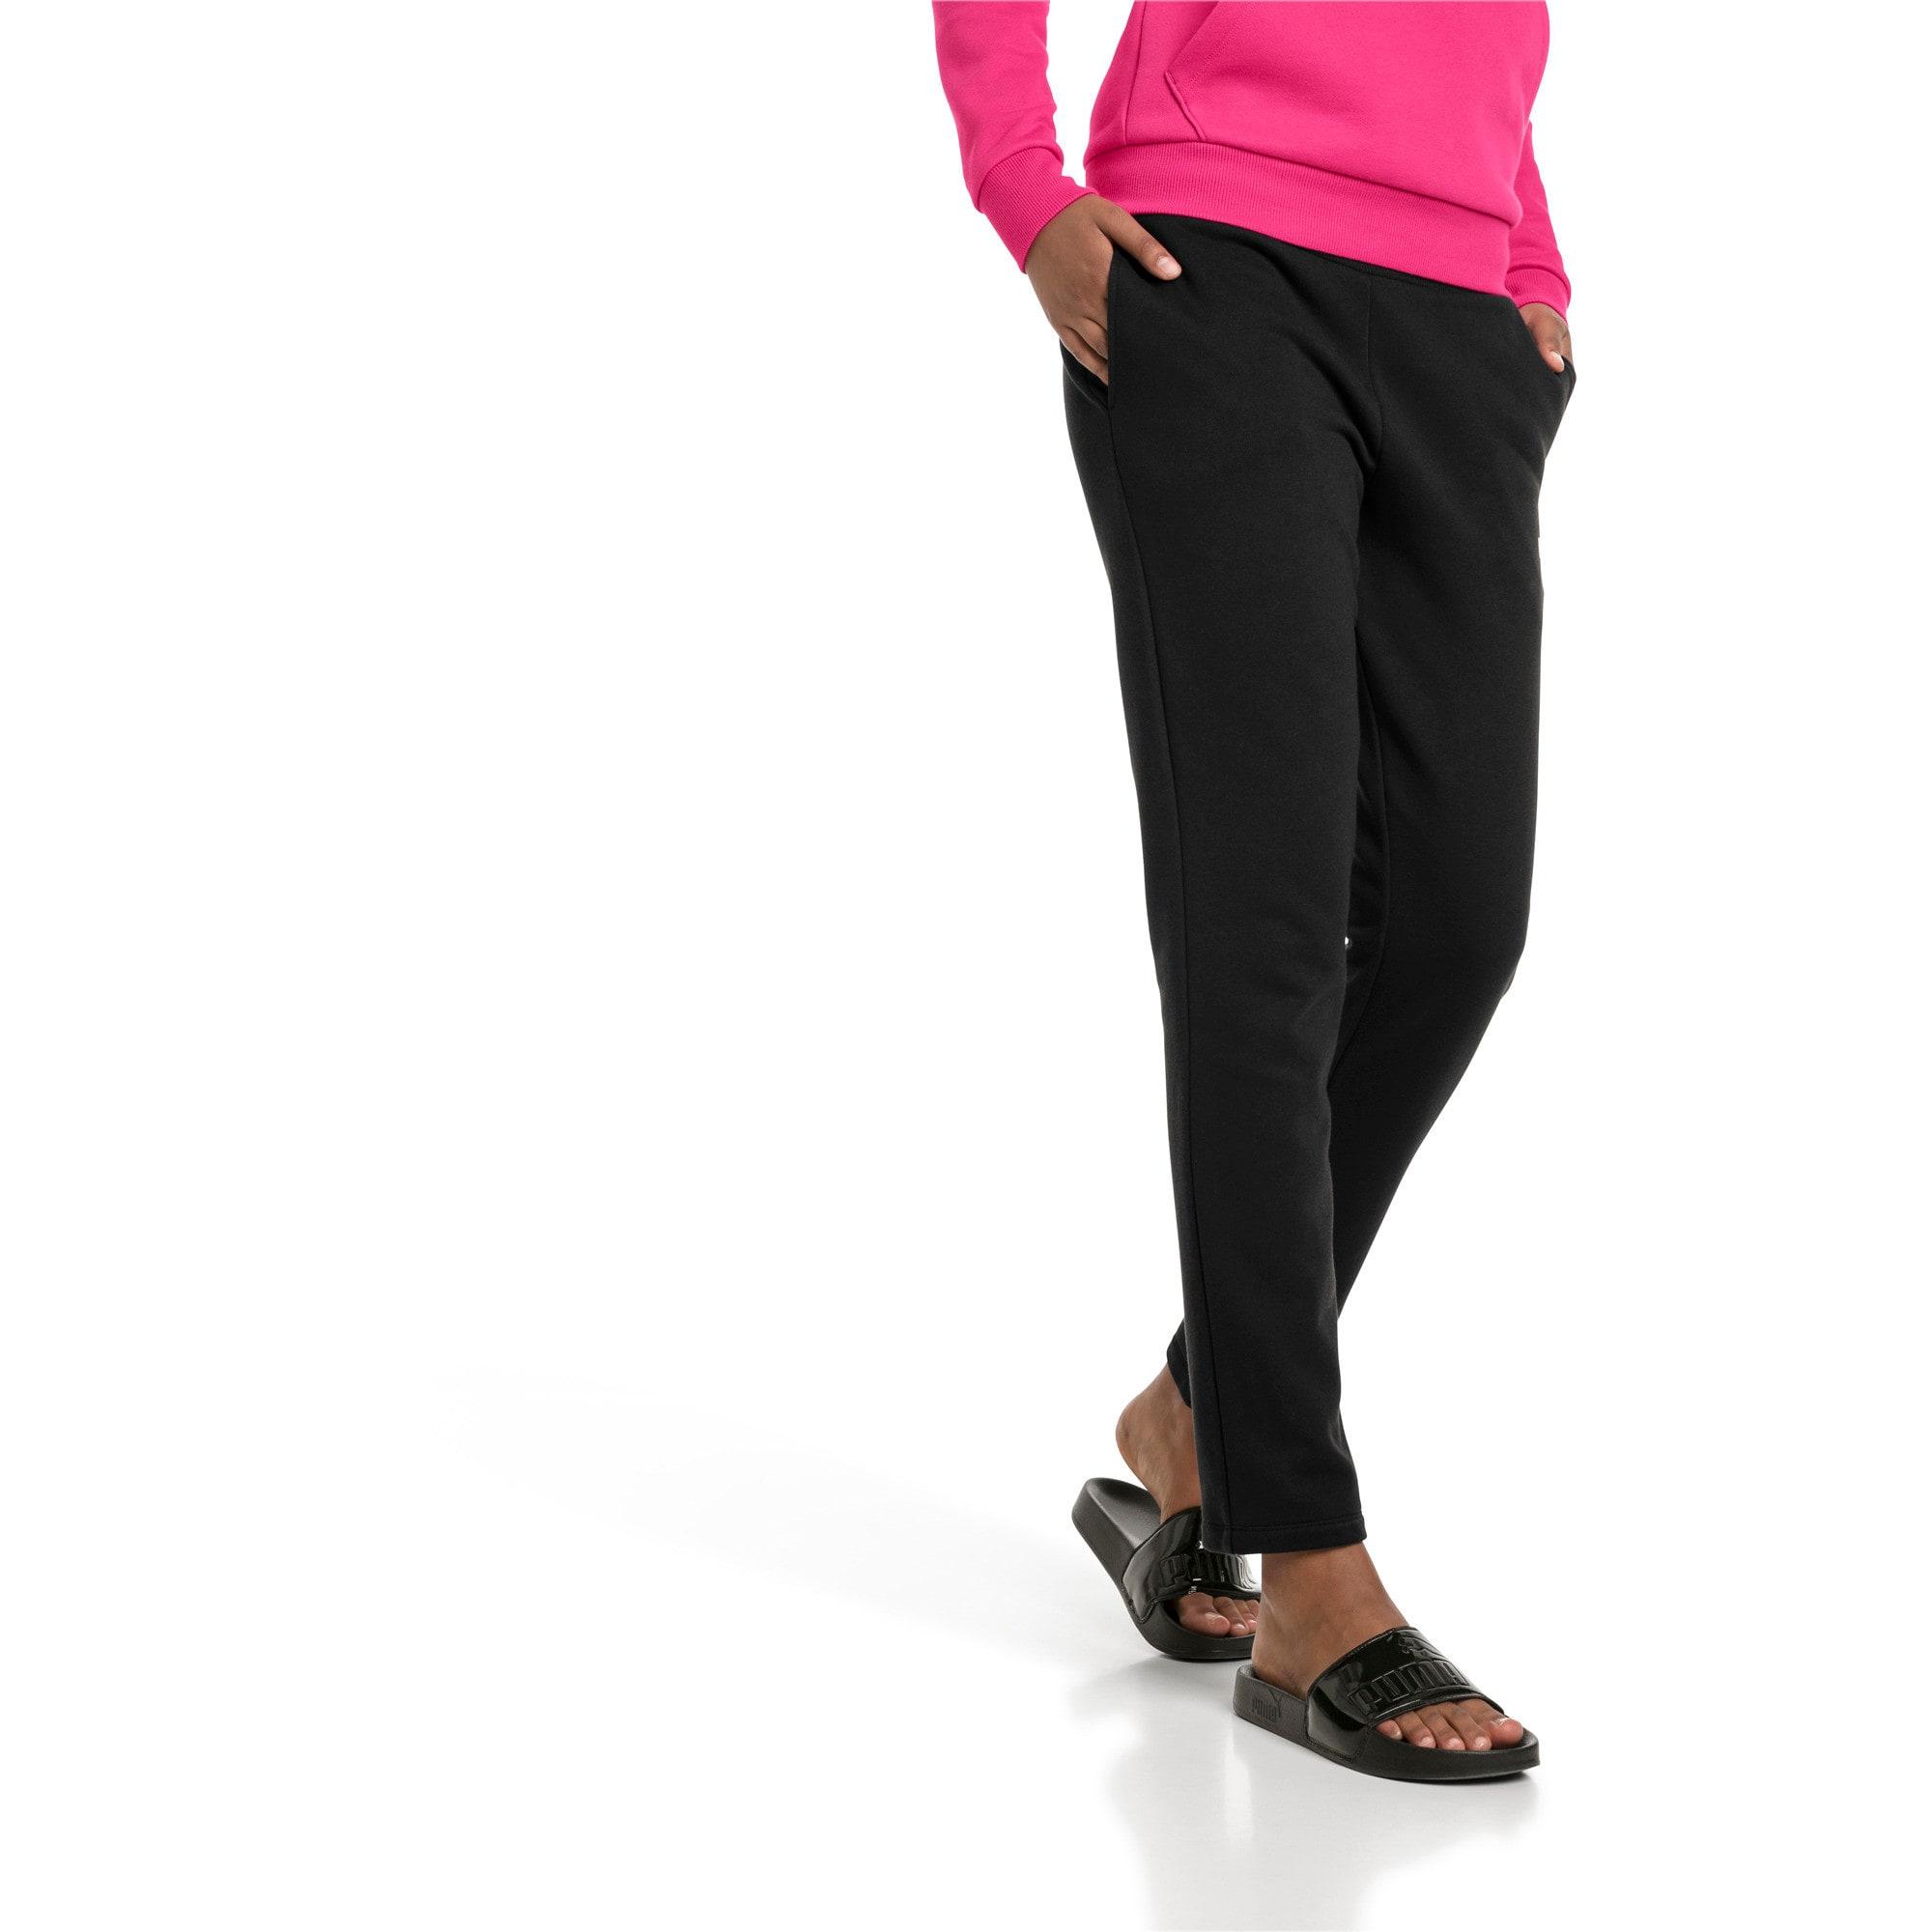 Thumbnail 1 of Essentials Fleece Women's Knitted Pants, Cotton Black, medium